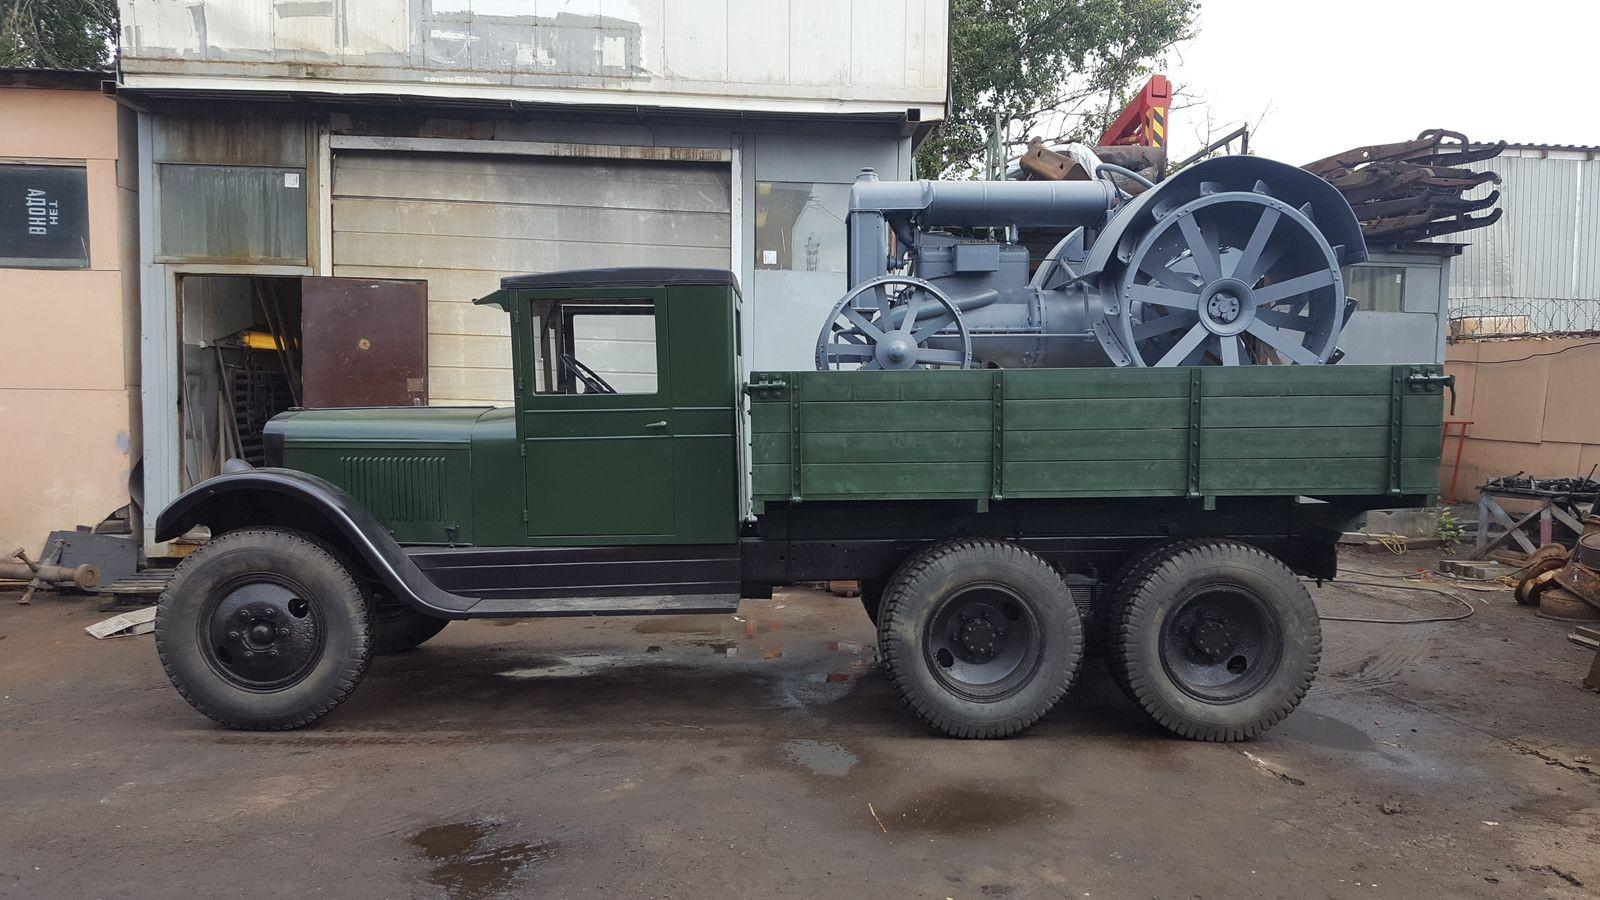 Генри, Федя, целина:  почти тест-драйв трактора «Фордзон-Путиловец»